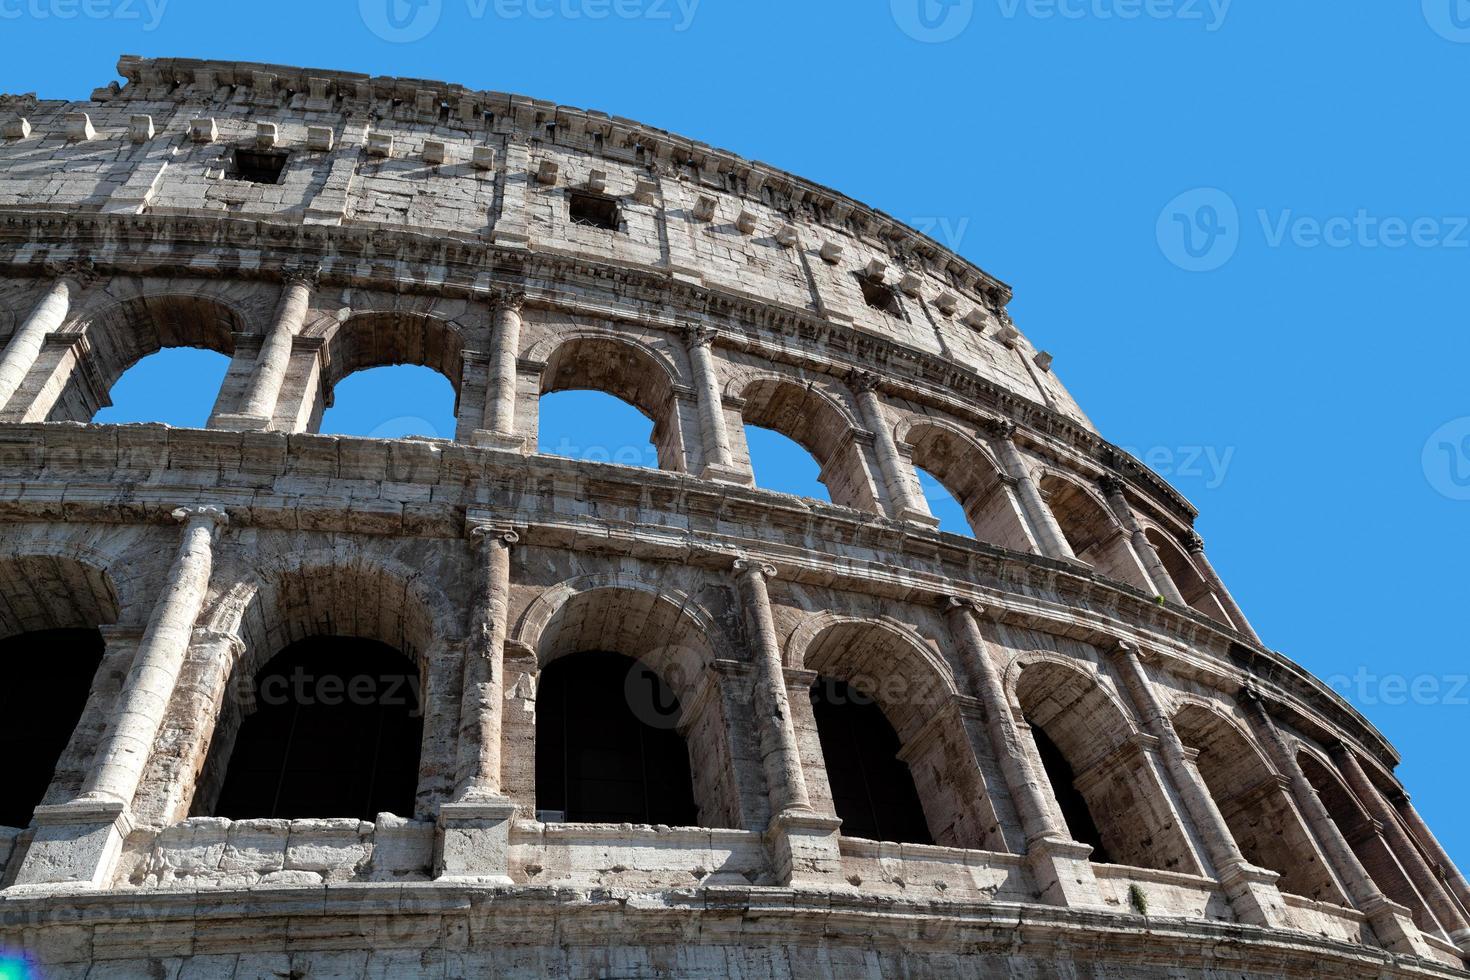 Coliseum photo